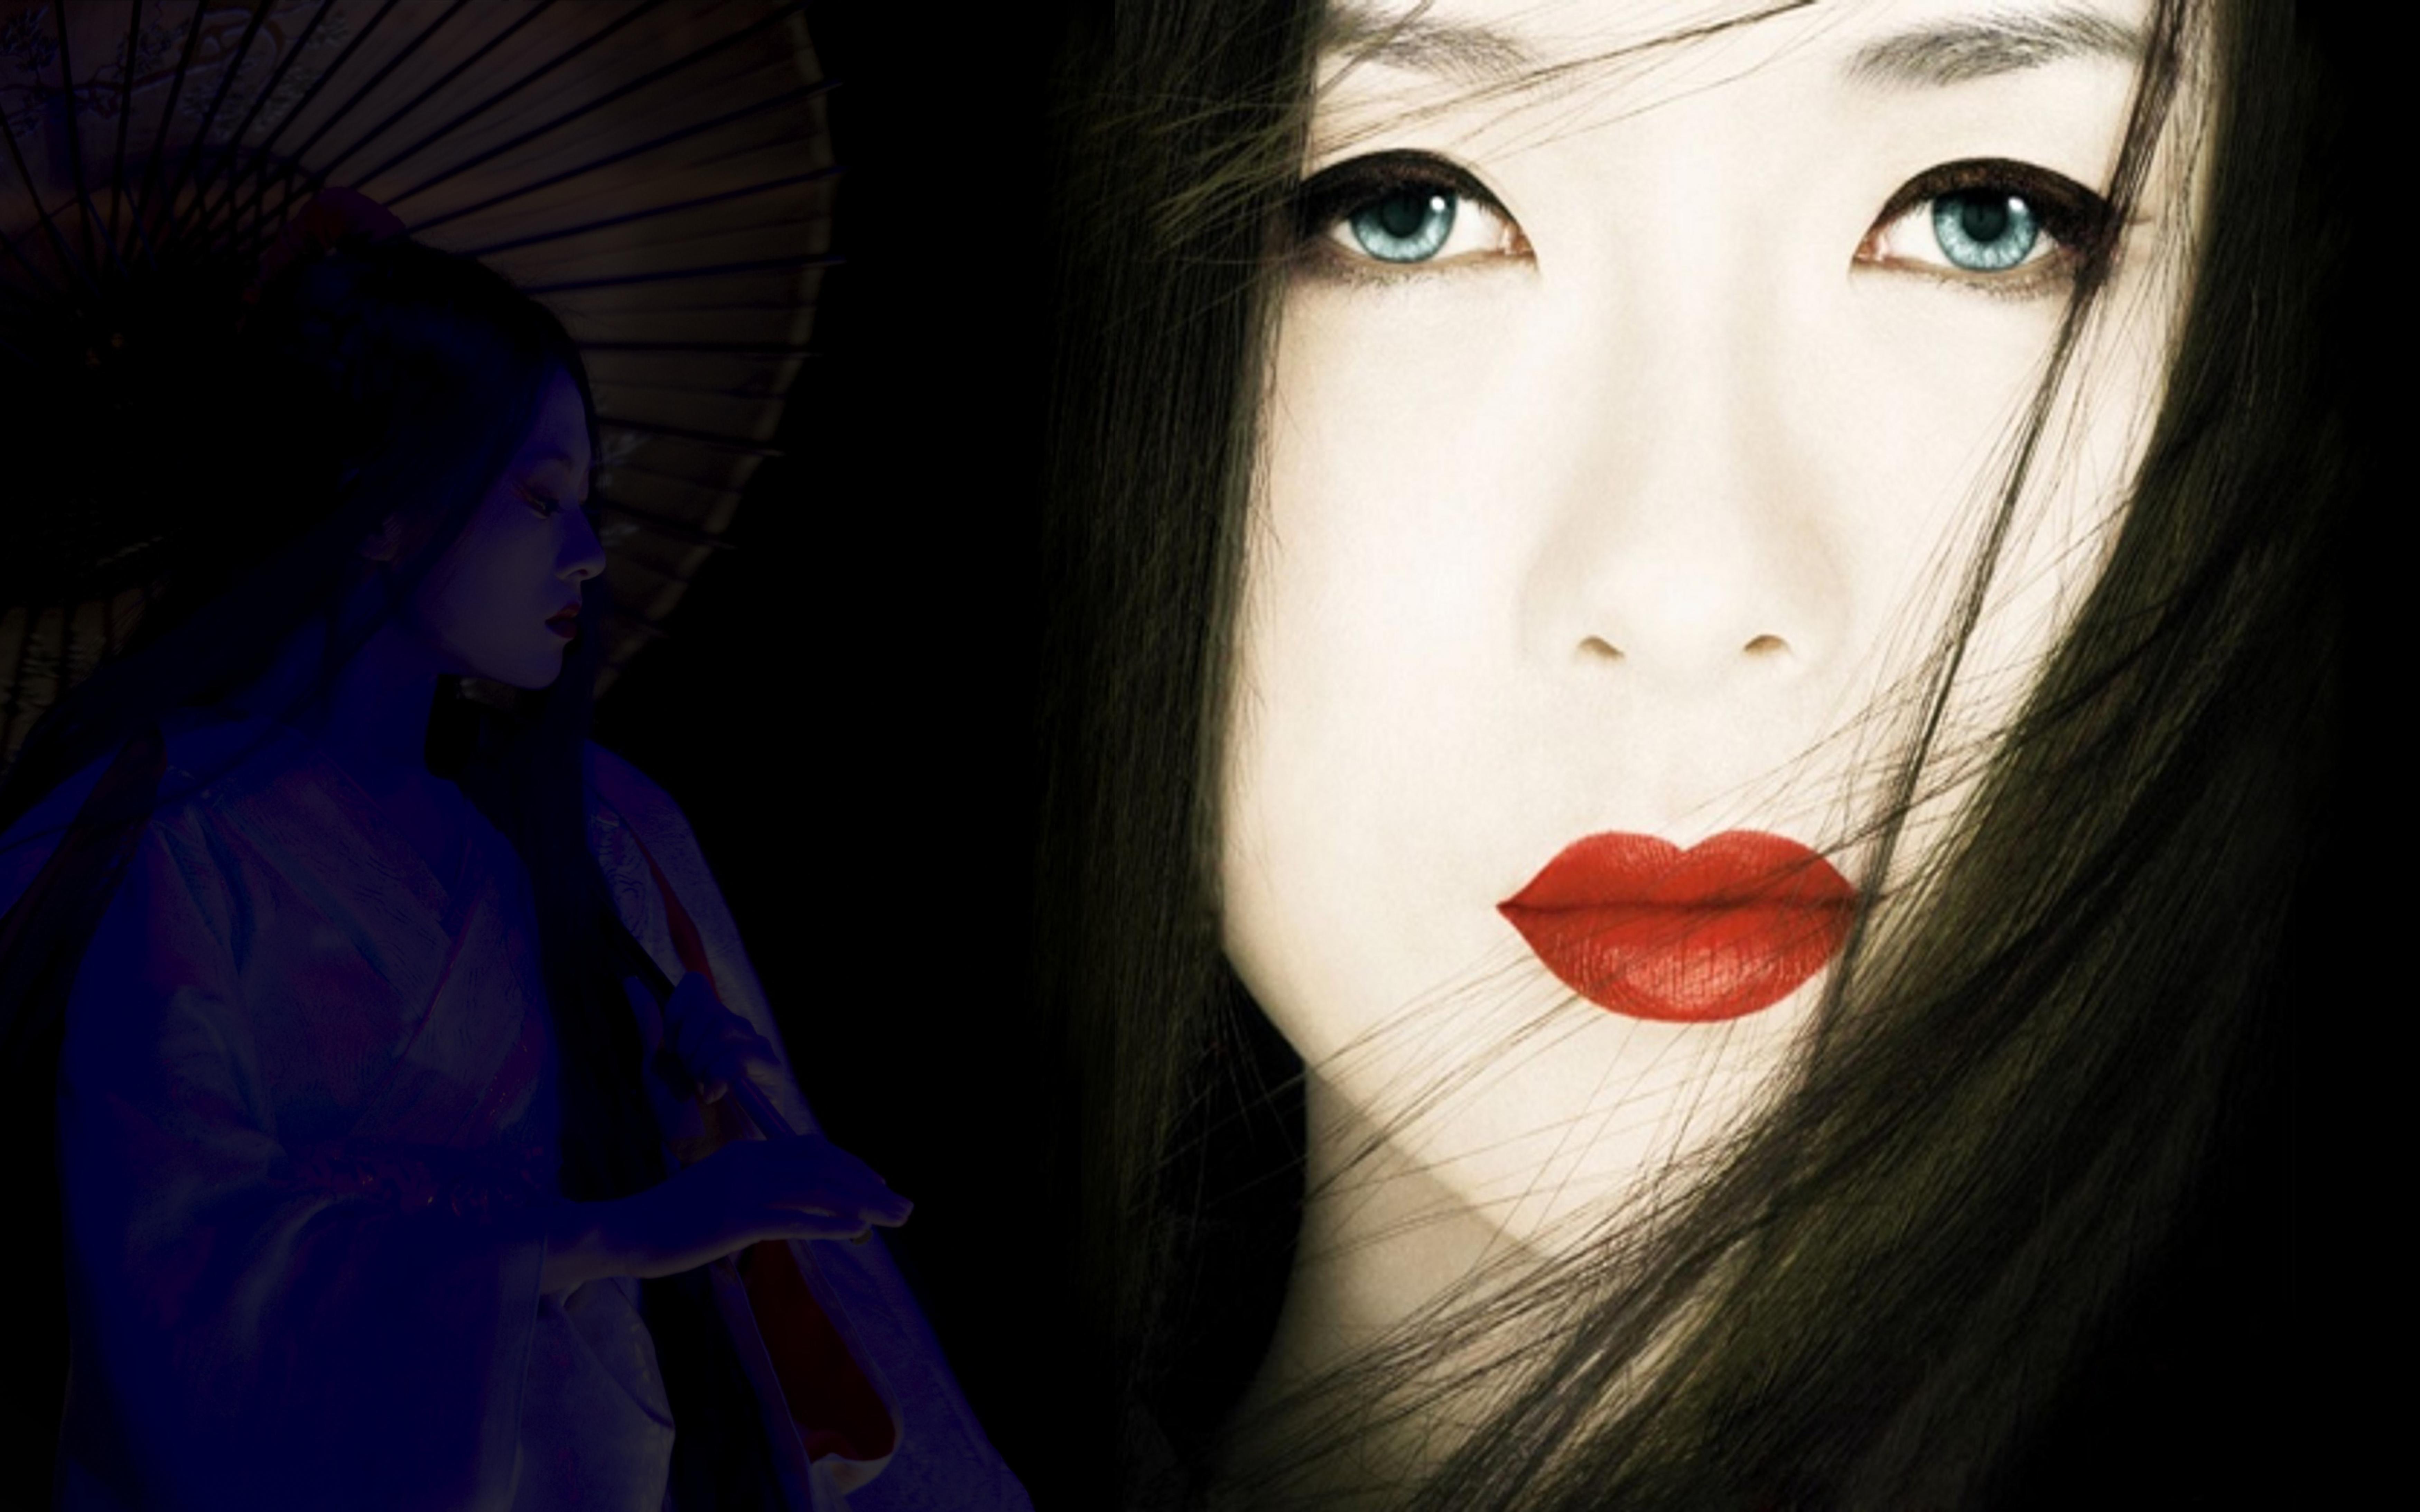 100 Years Of Japanese Beauty From Geisha to Harajuku 7000x4375